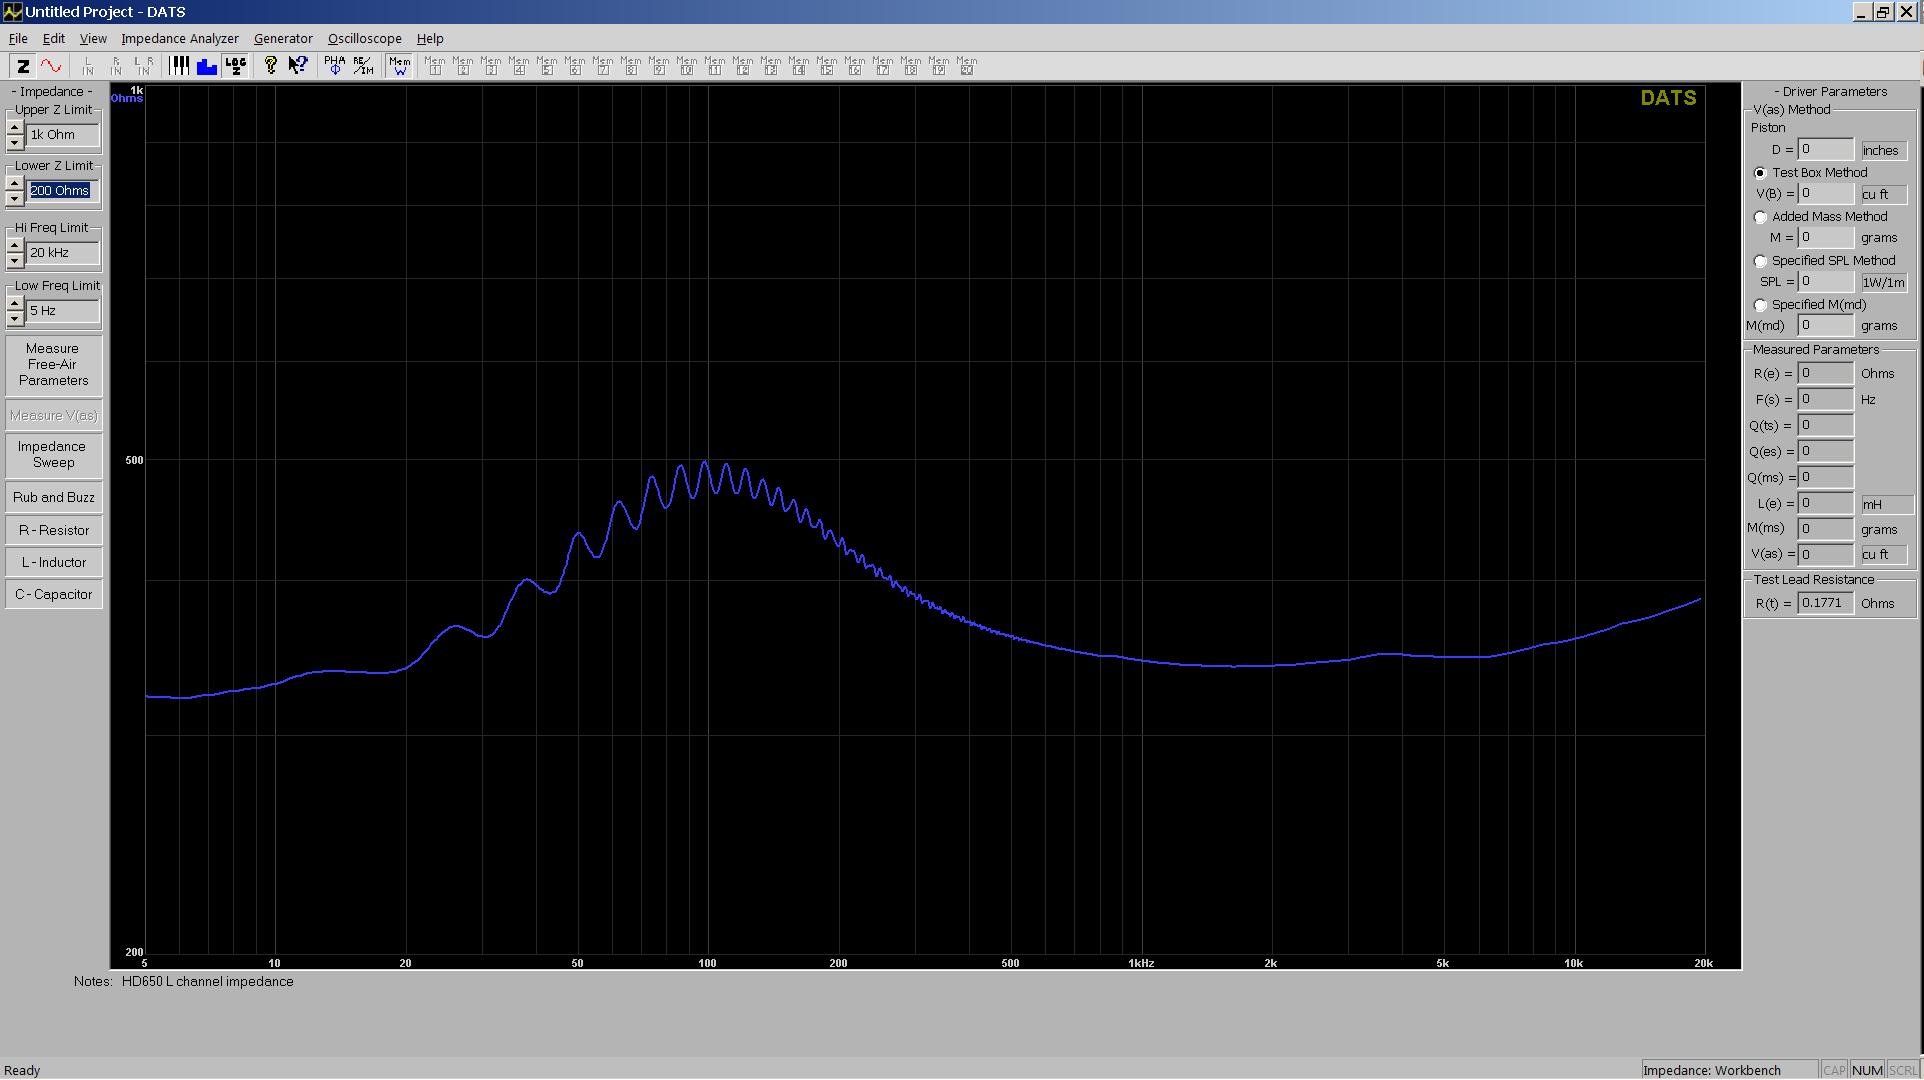 20210702 HD650 impedance DATS L.png